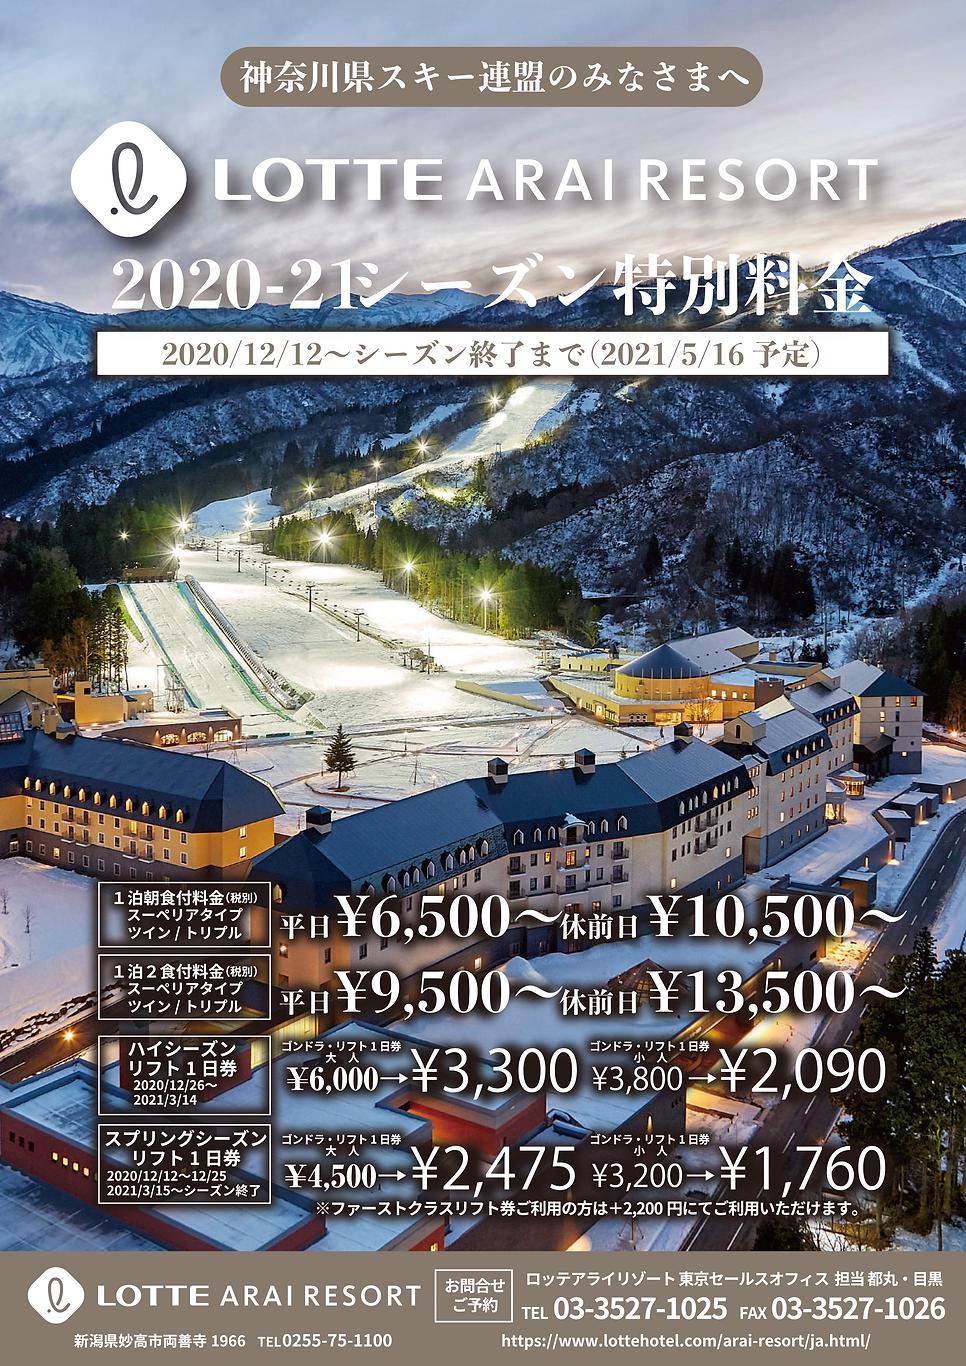 神奈川県スキー連盟会員様特別料金.png